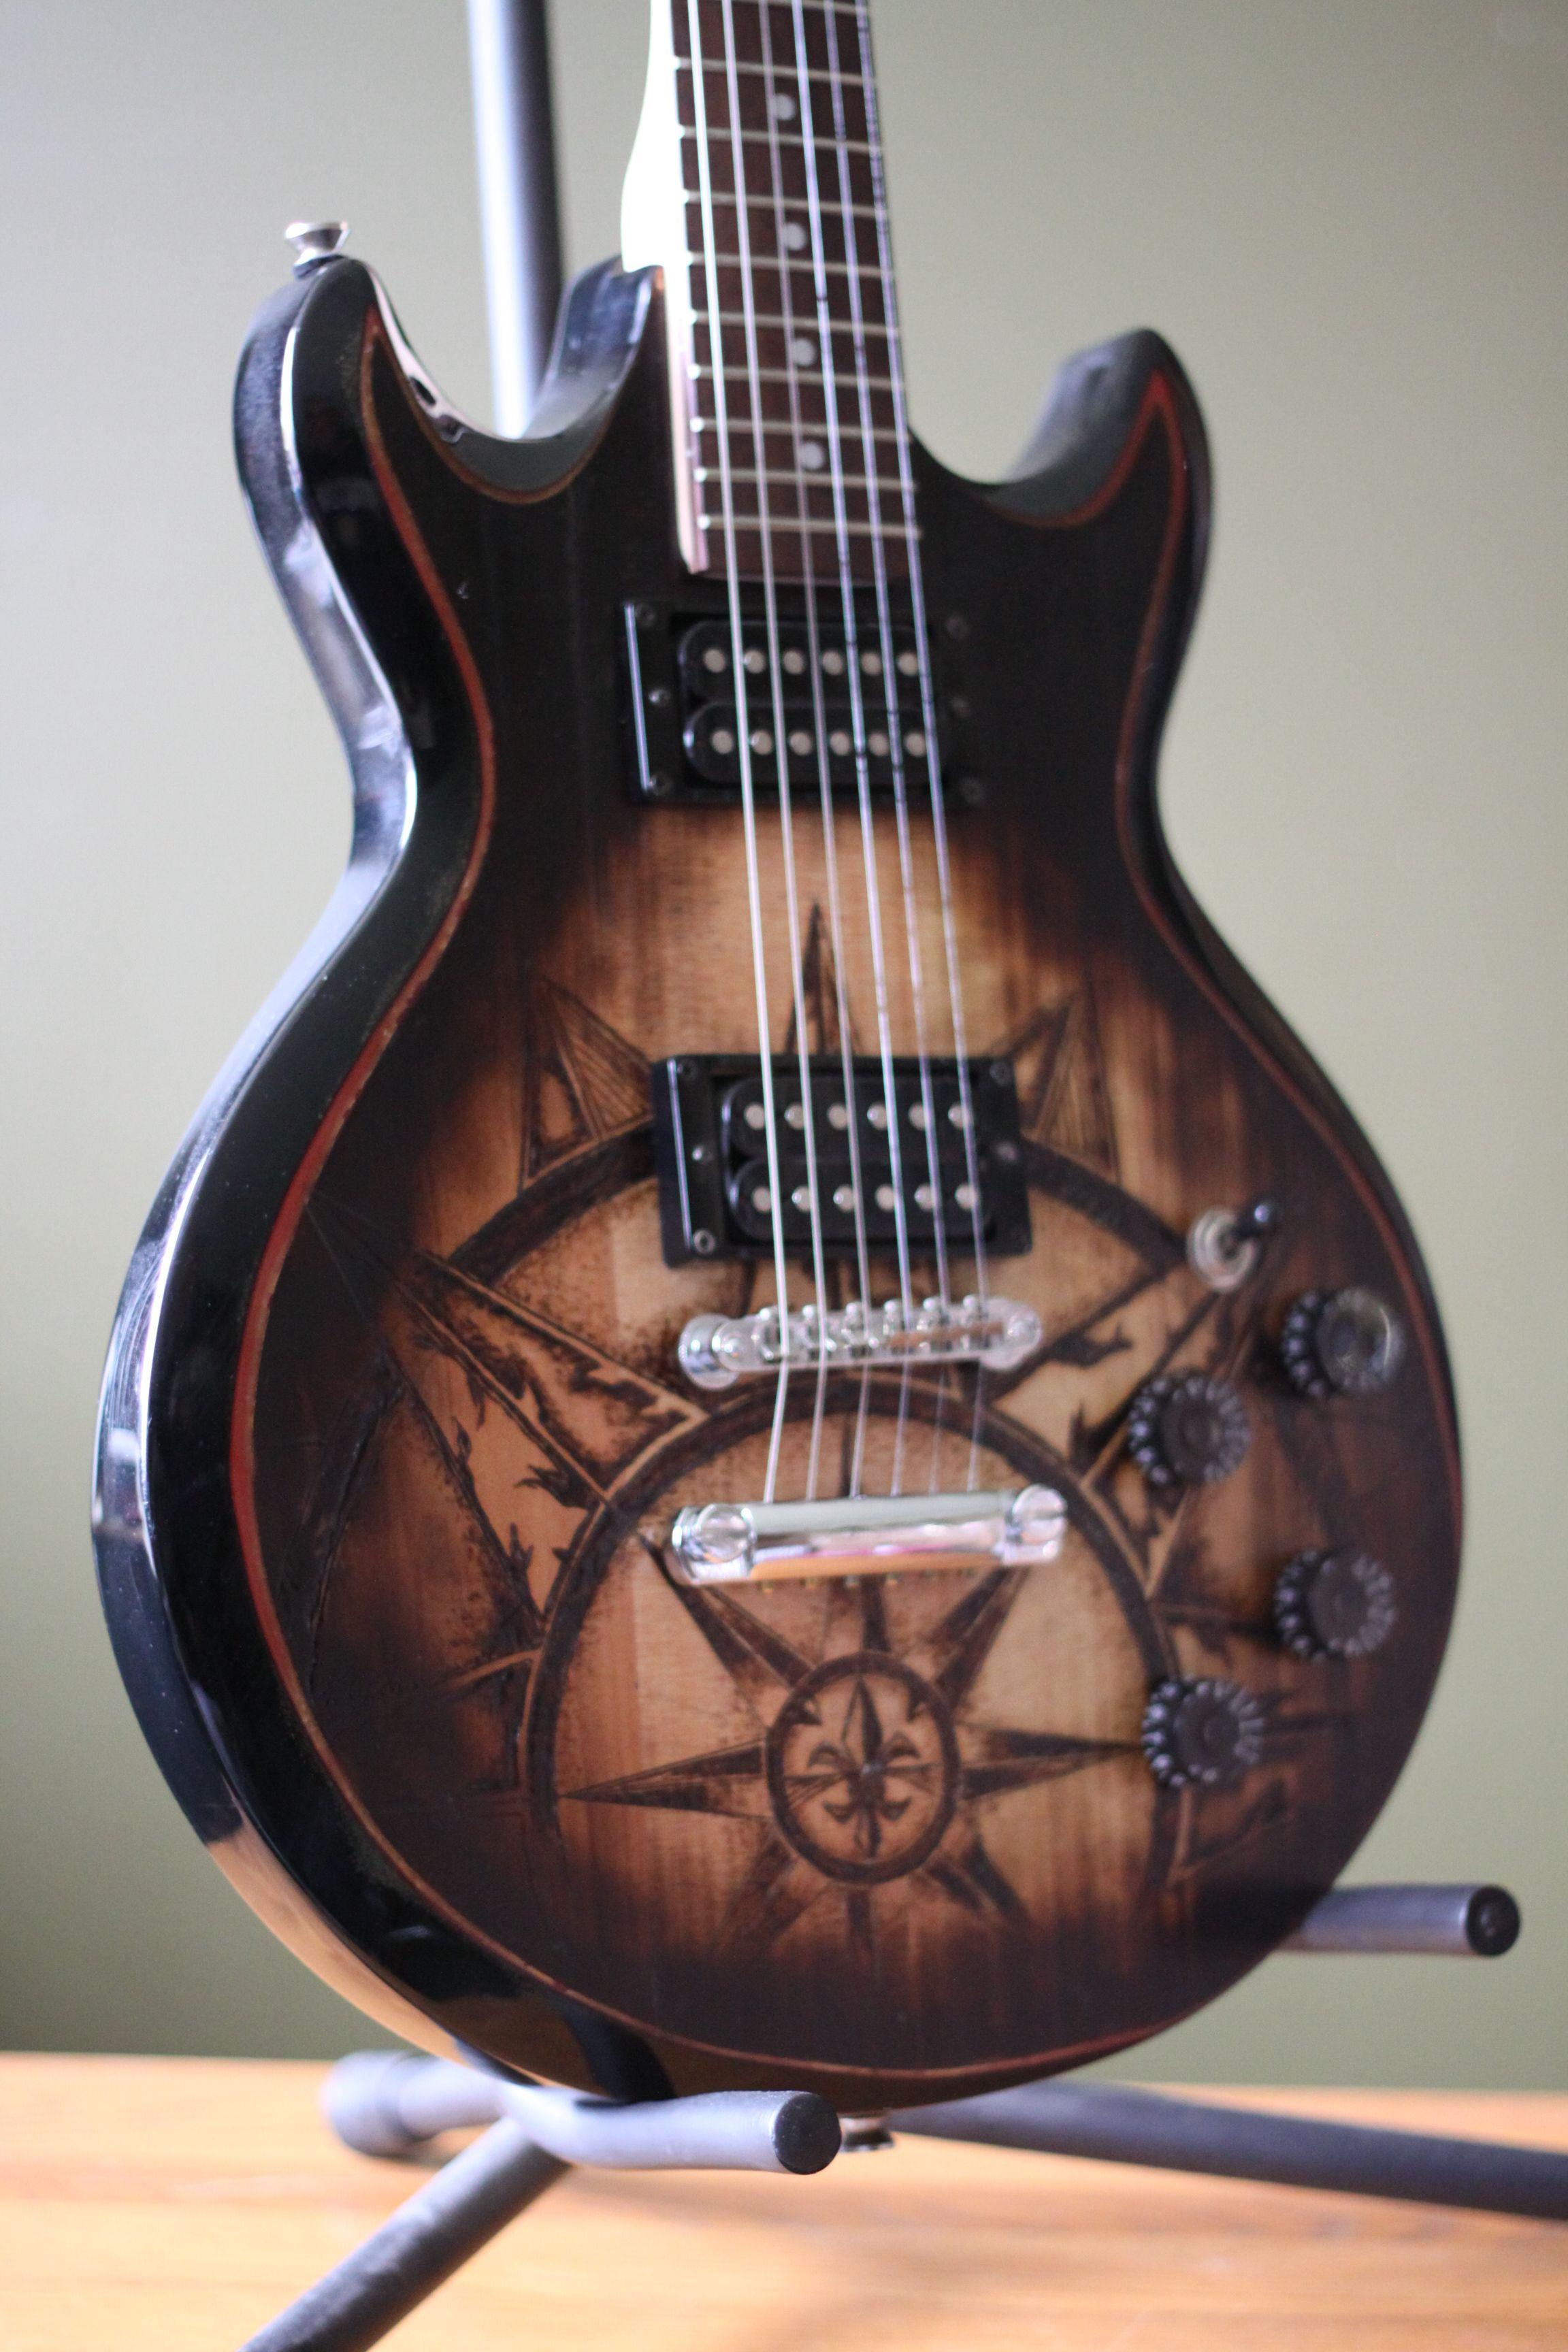 Tilted Side Ibanez Custom Wood Burn Guitar On Pinterest Steampunk Fender Telecaster And Epiphone Painting Art Cool